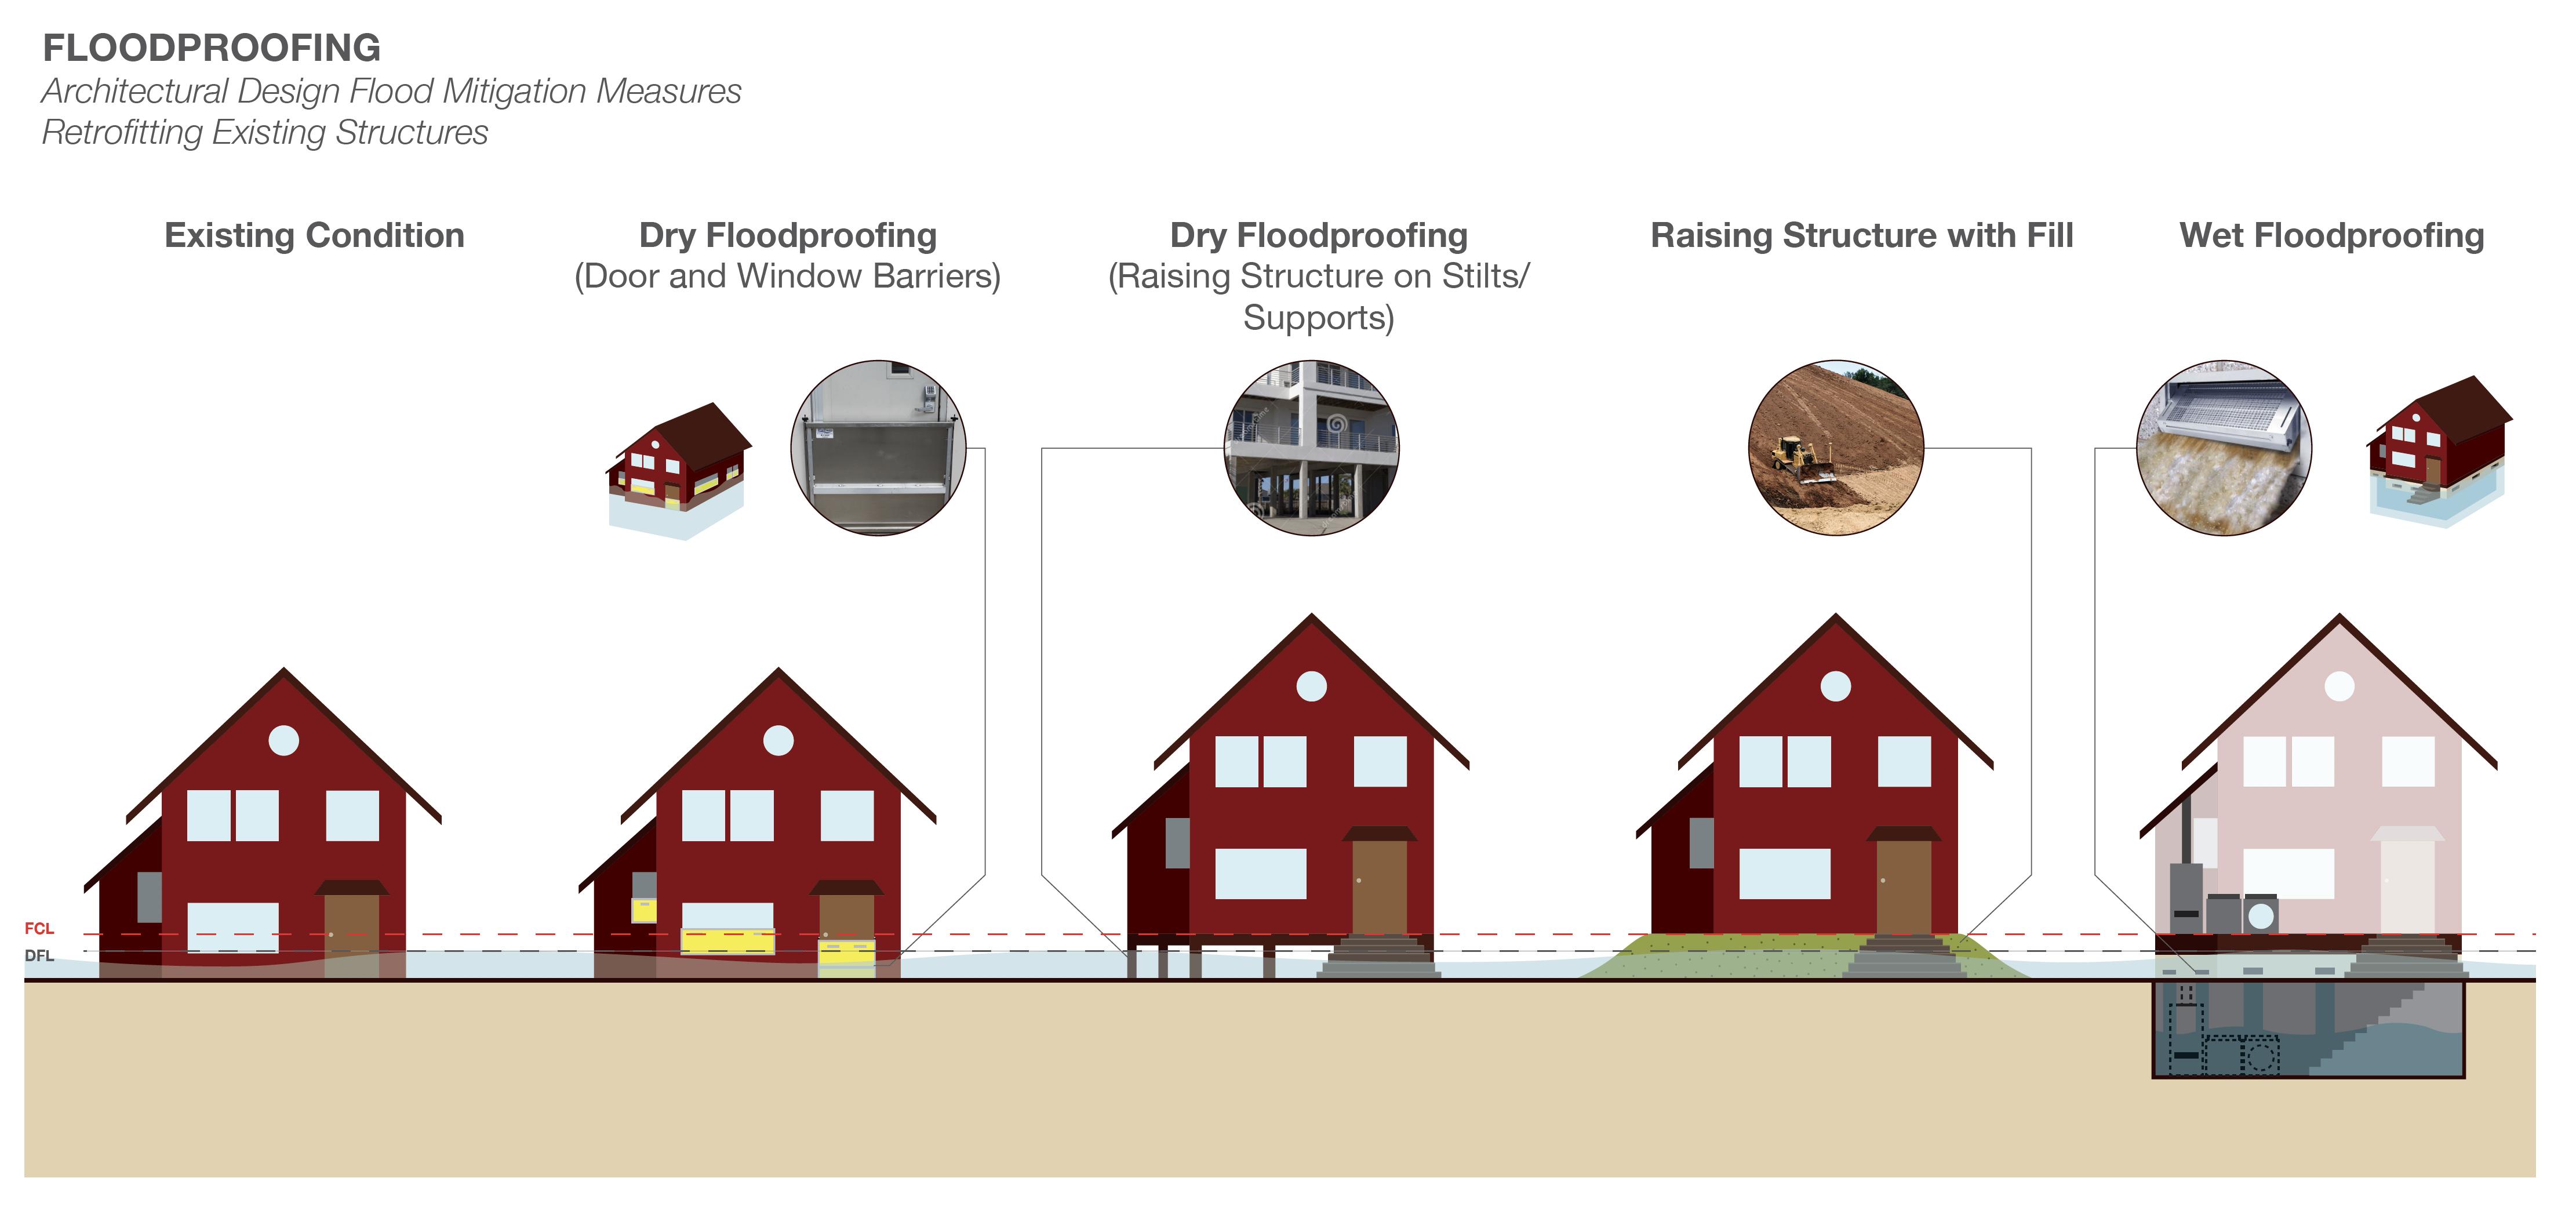 FLOODPROOFING Architectural Design Flood Mitigation Measures